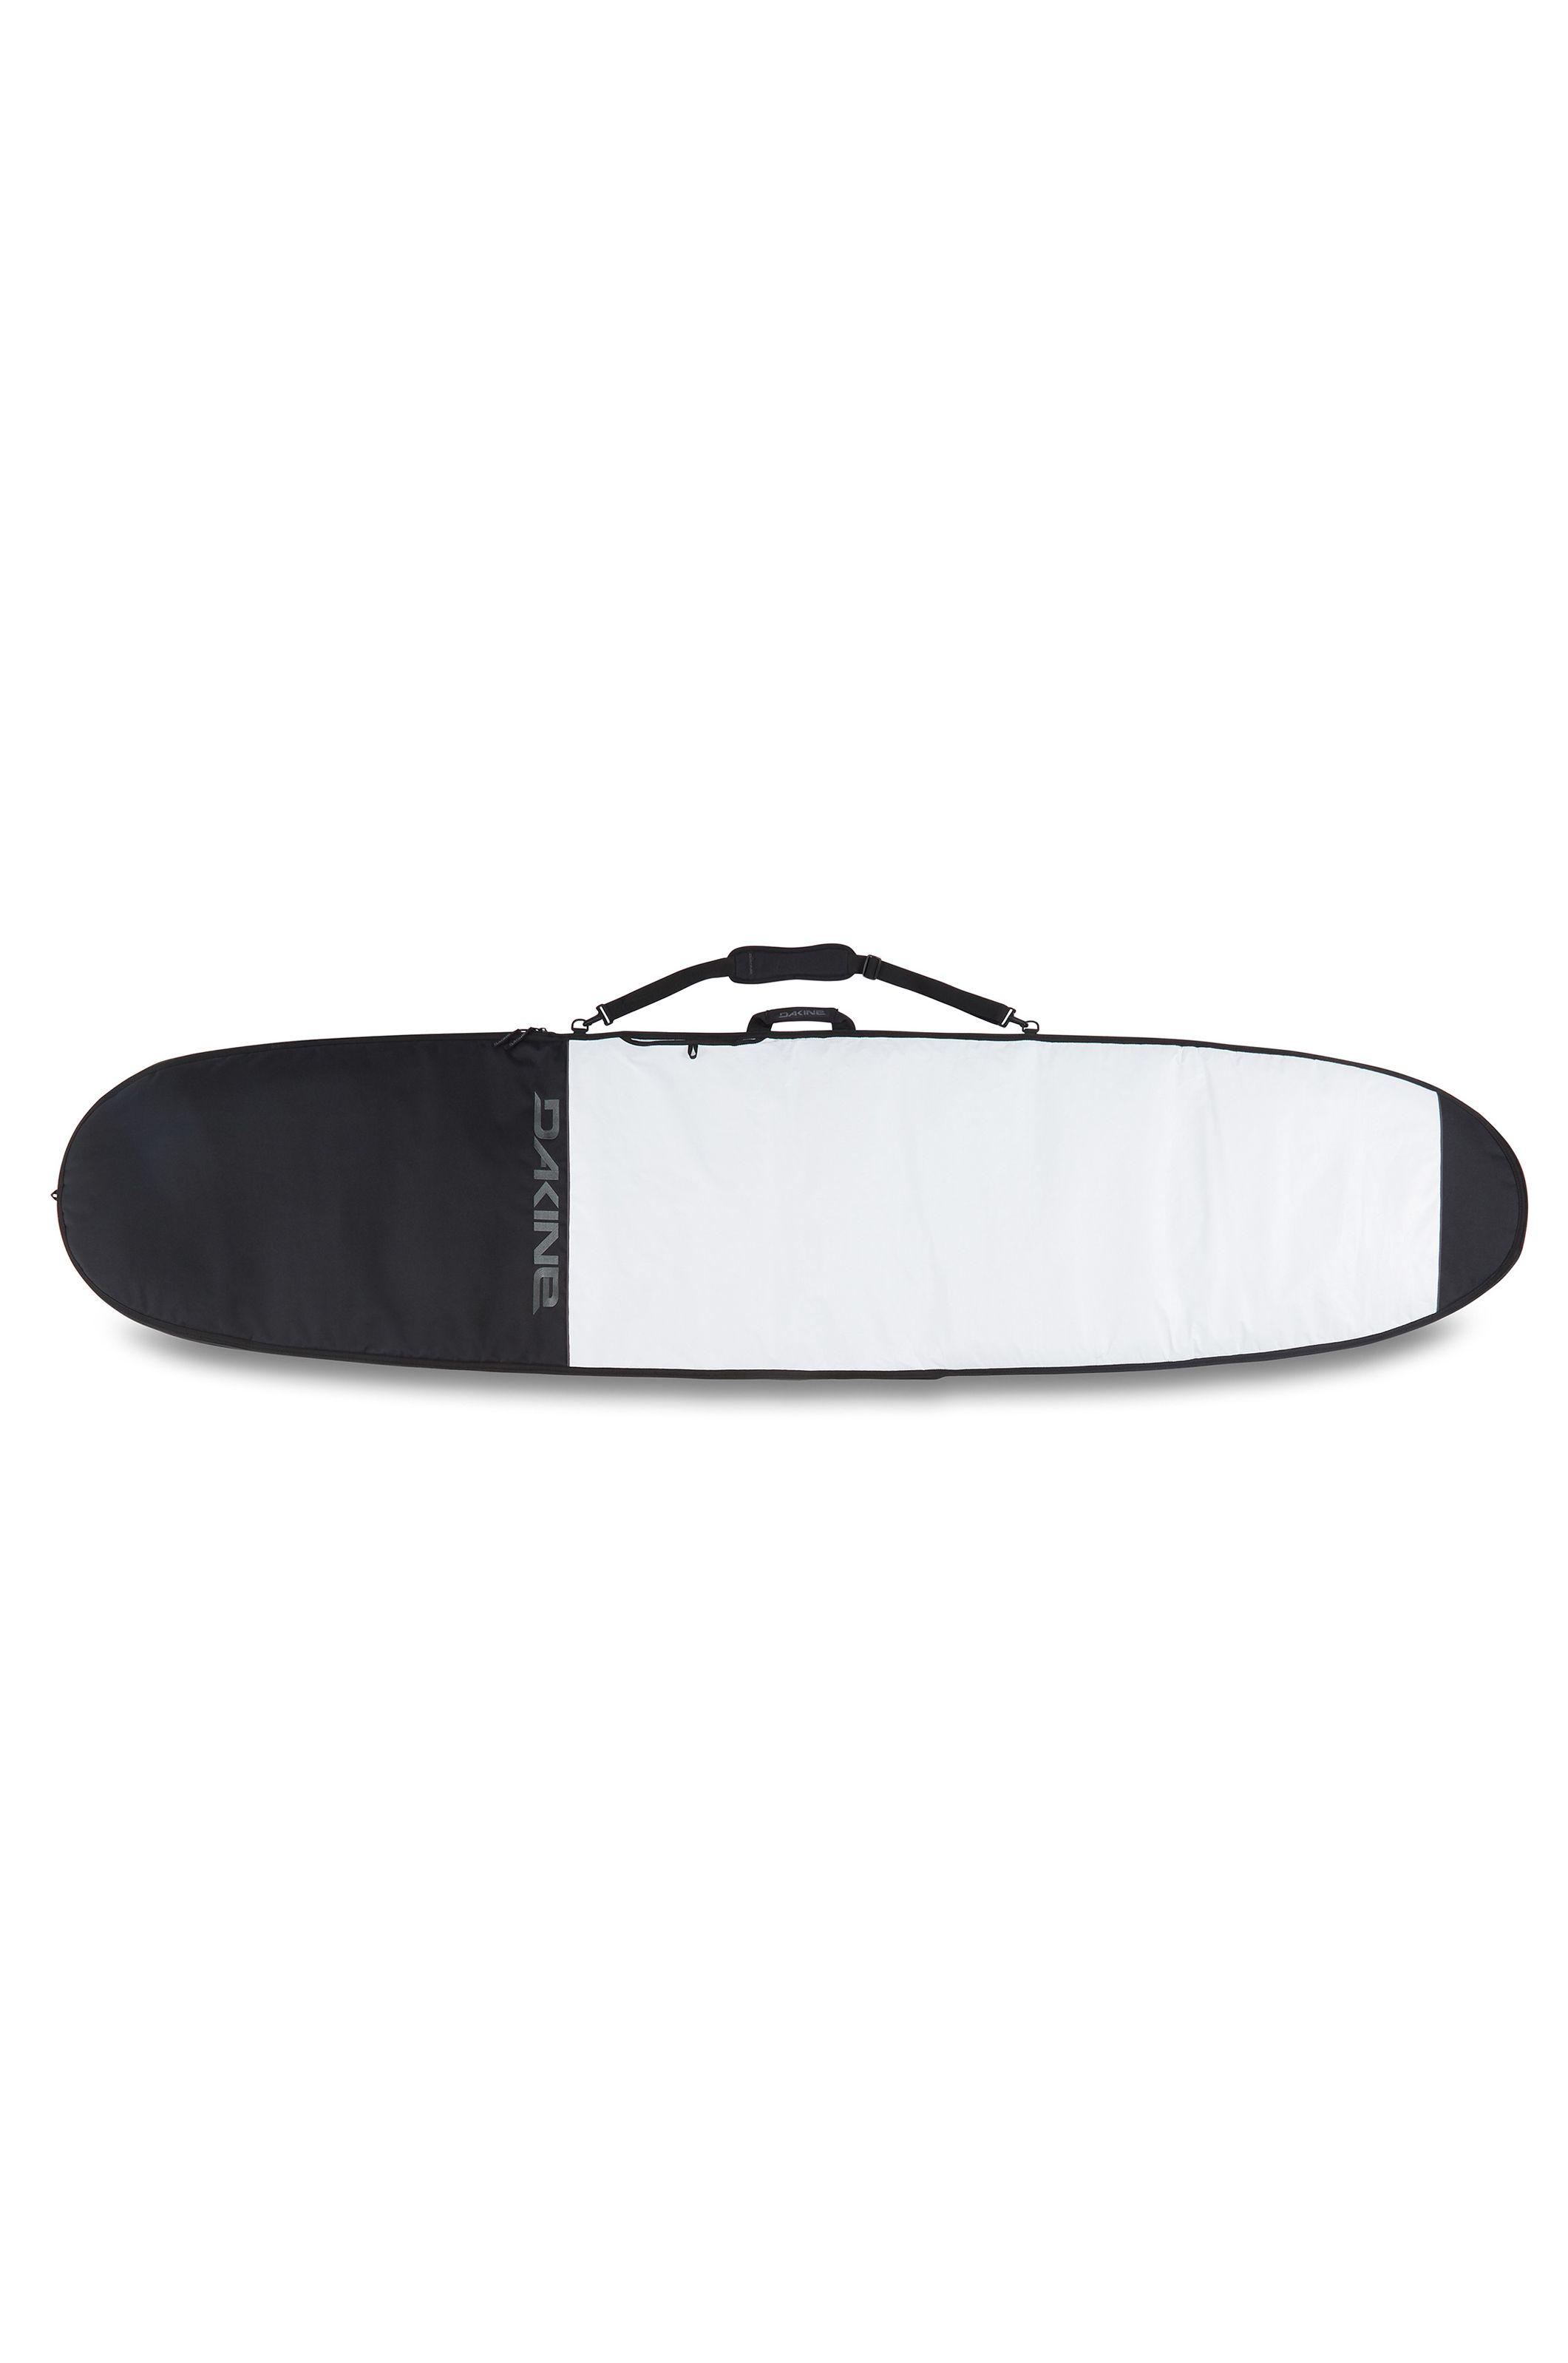 Dakine Boardbag 9'6 DAYLIGHT SURFBOARD BAG NOSERIDER White